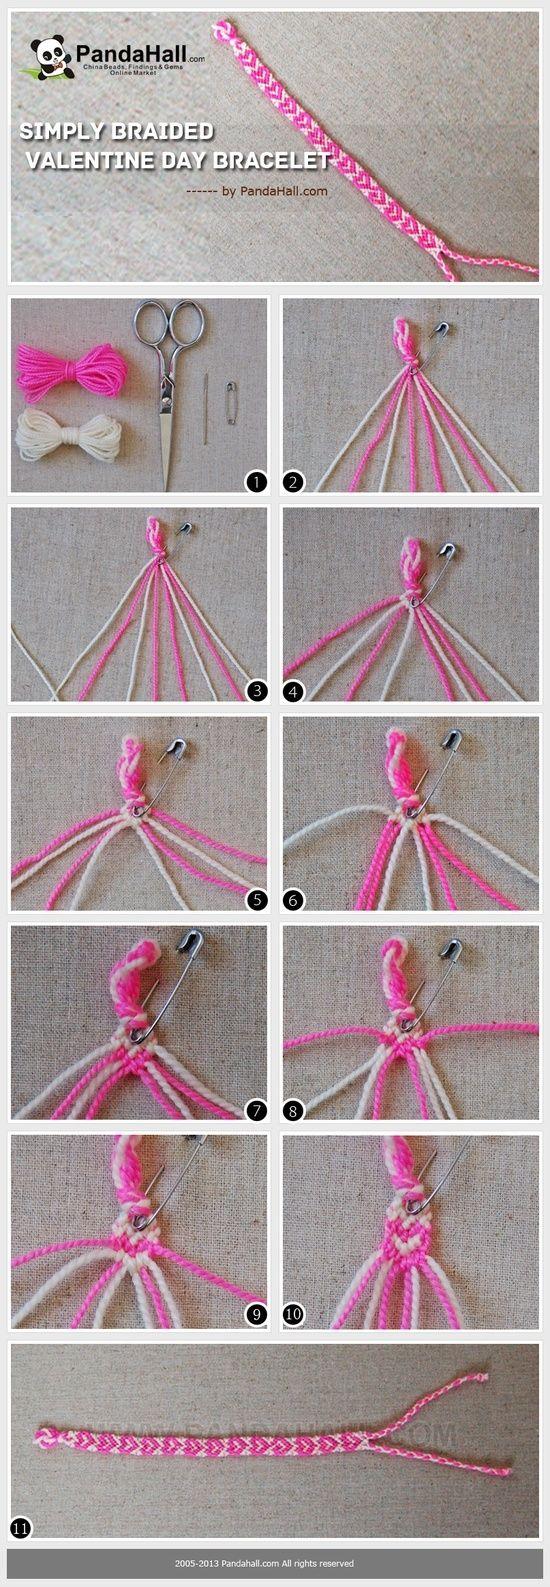 simply braided valentine day bracelet a heartfelt way to